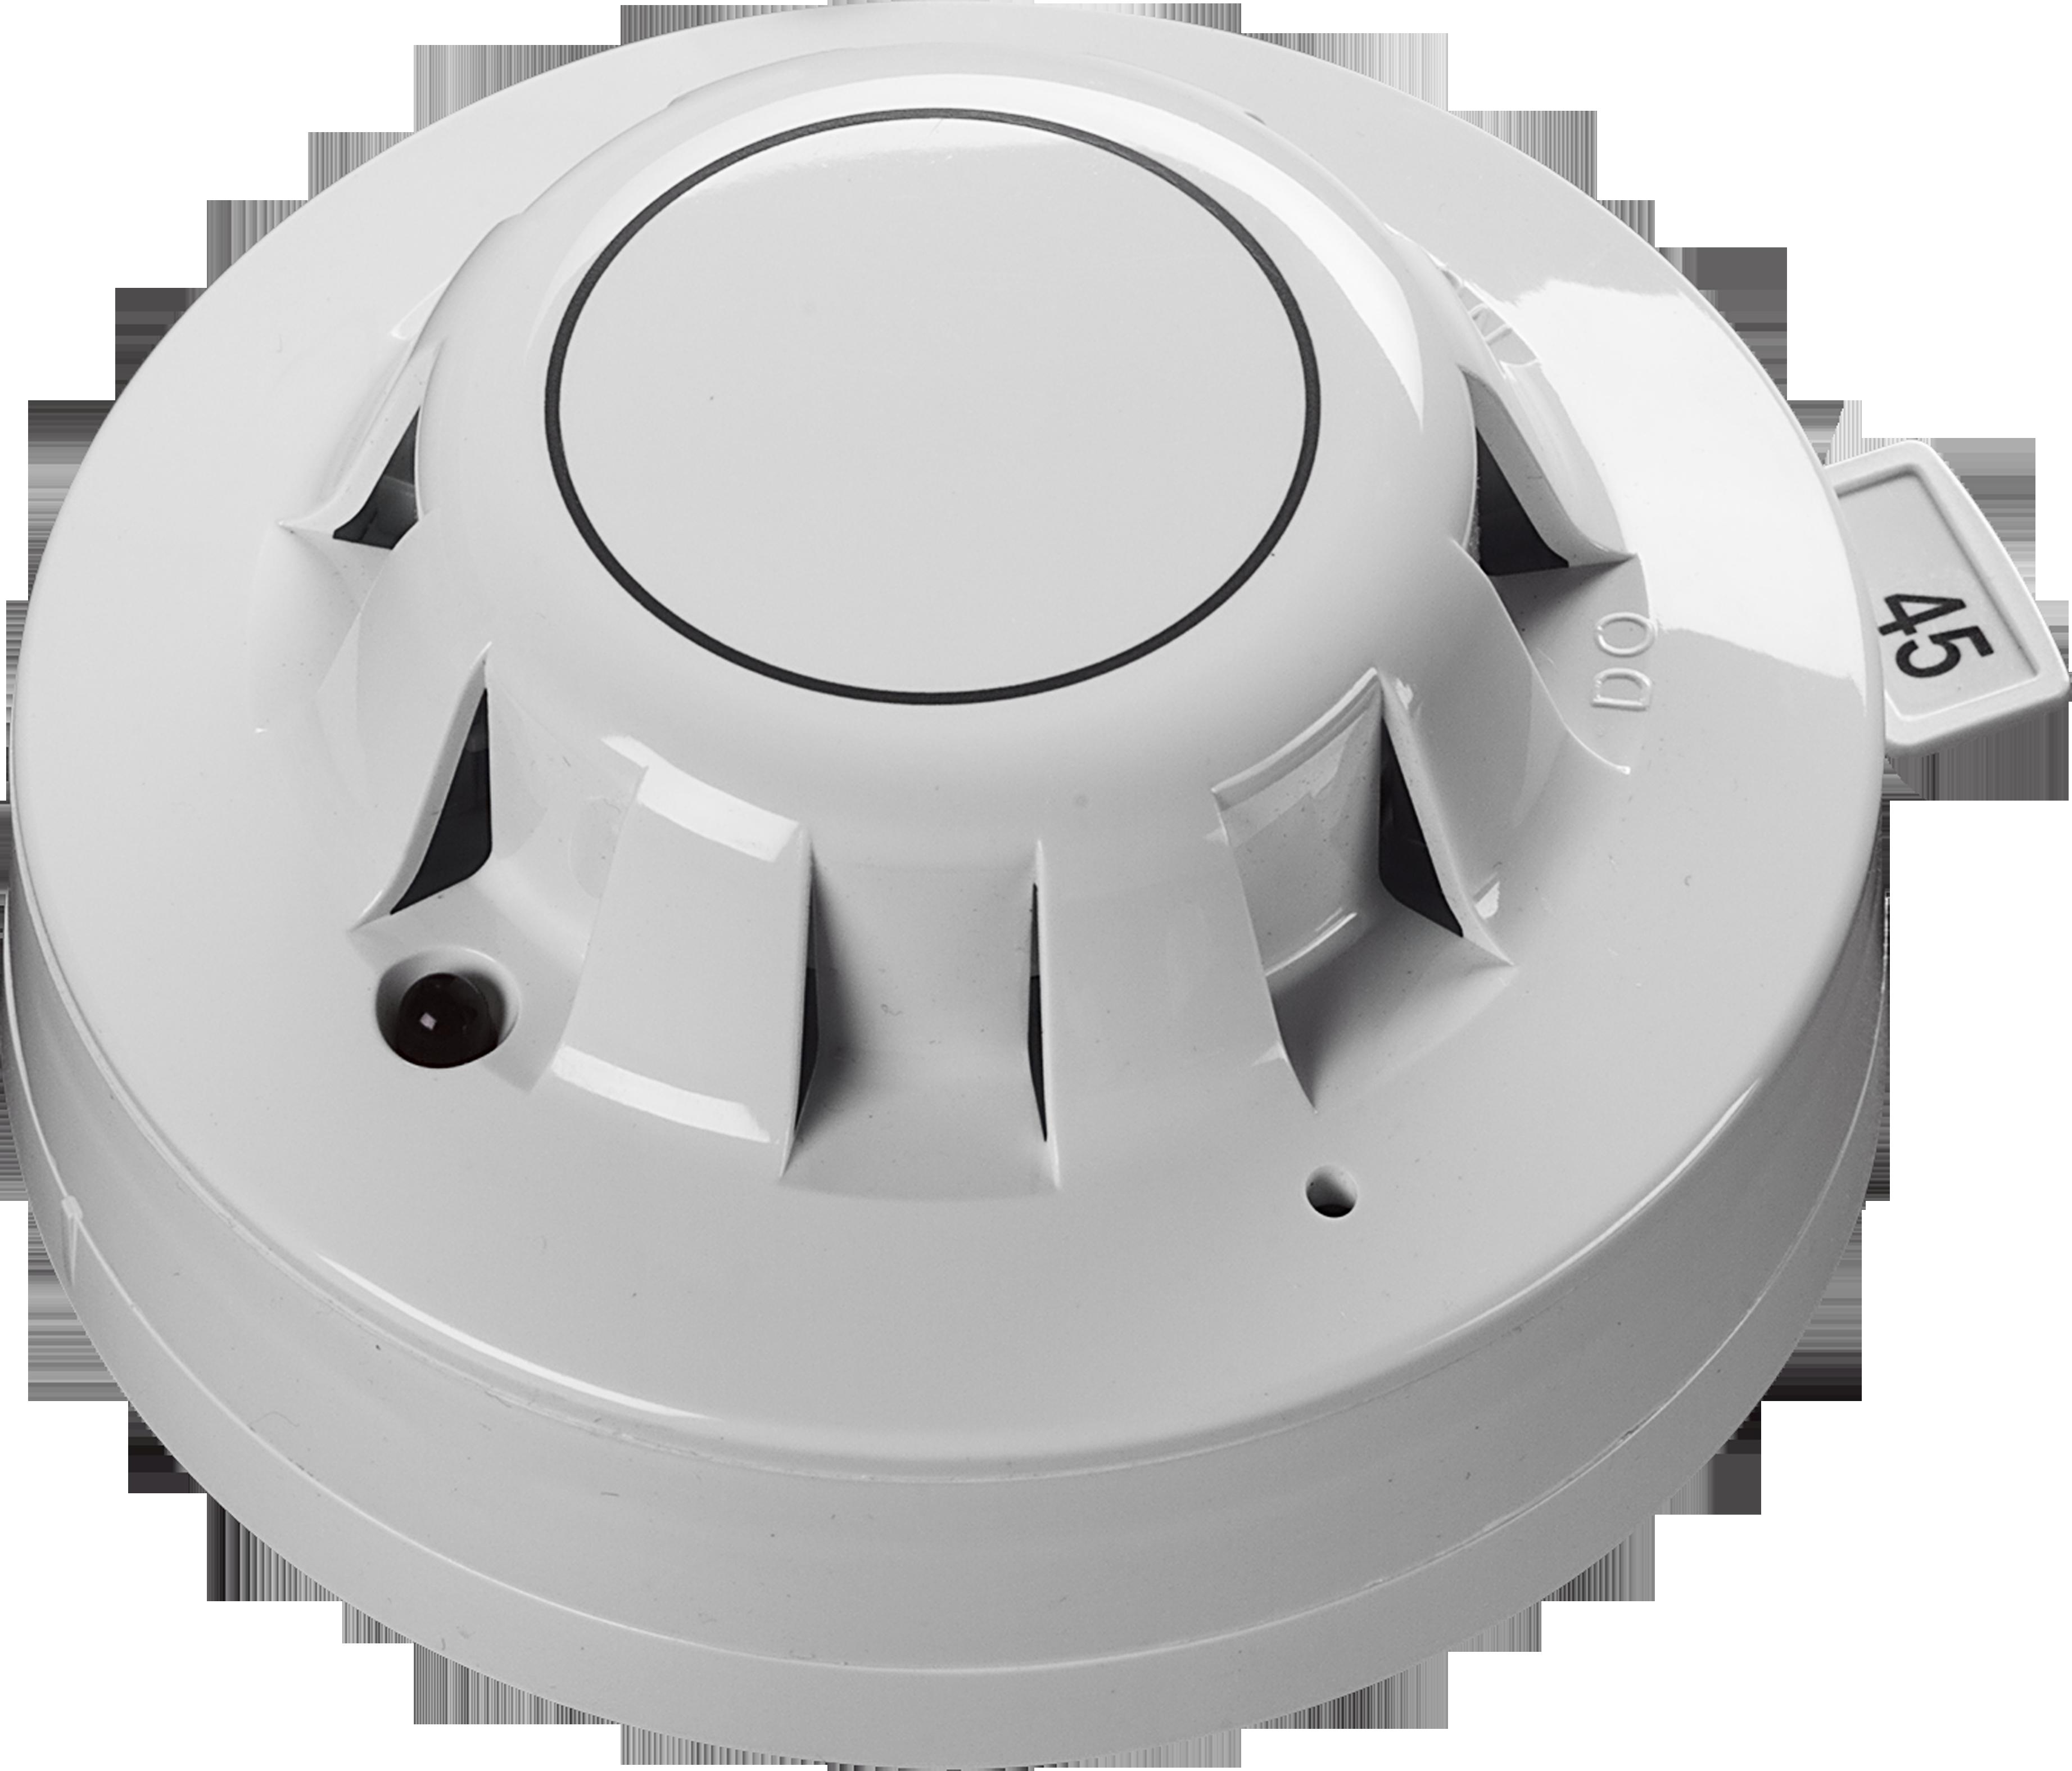 Analoginis adresinis dūminis detektorius Apollo XP95